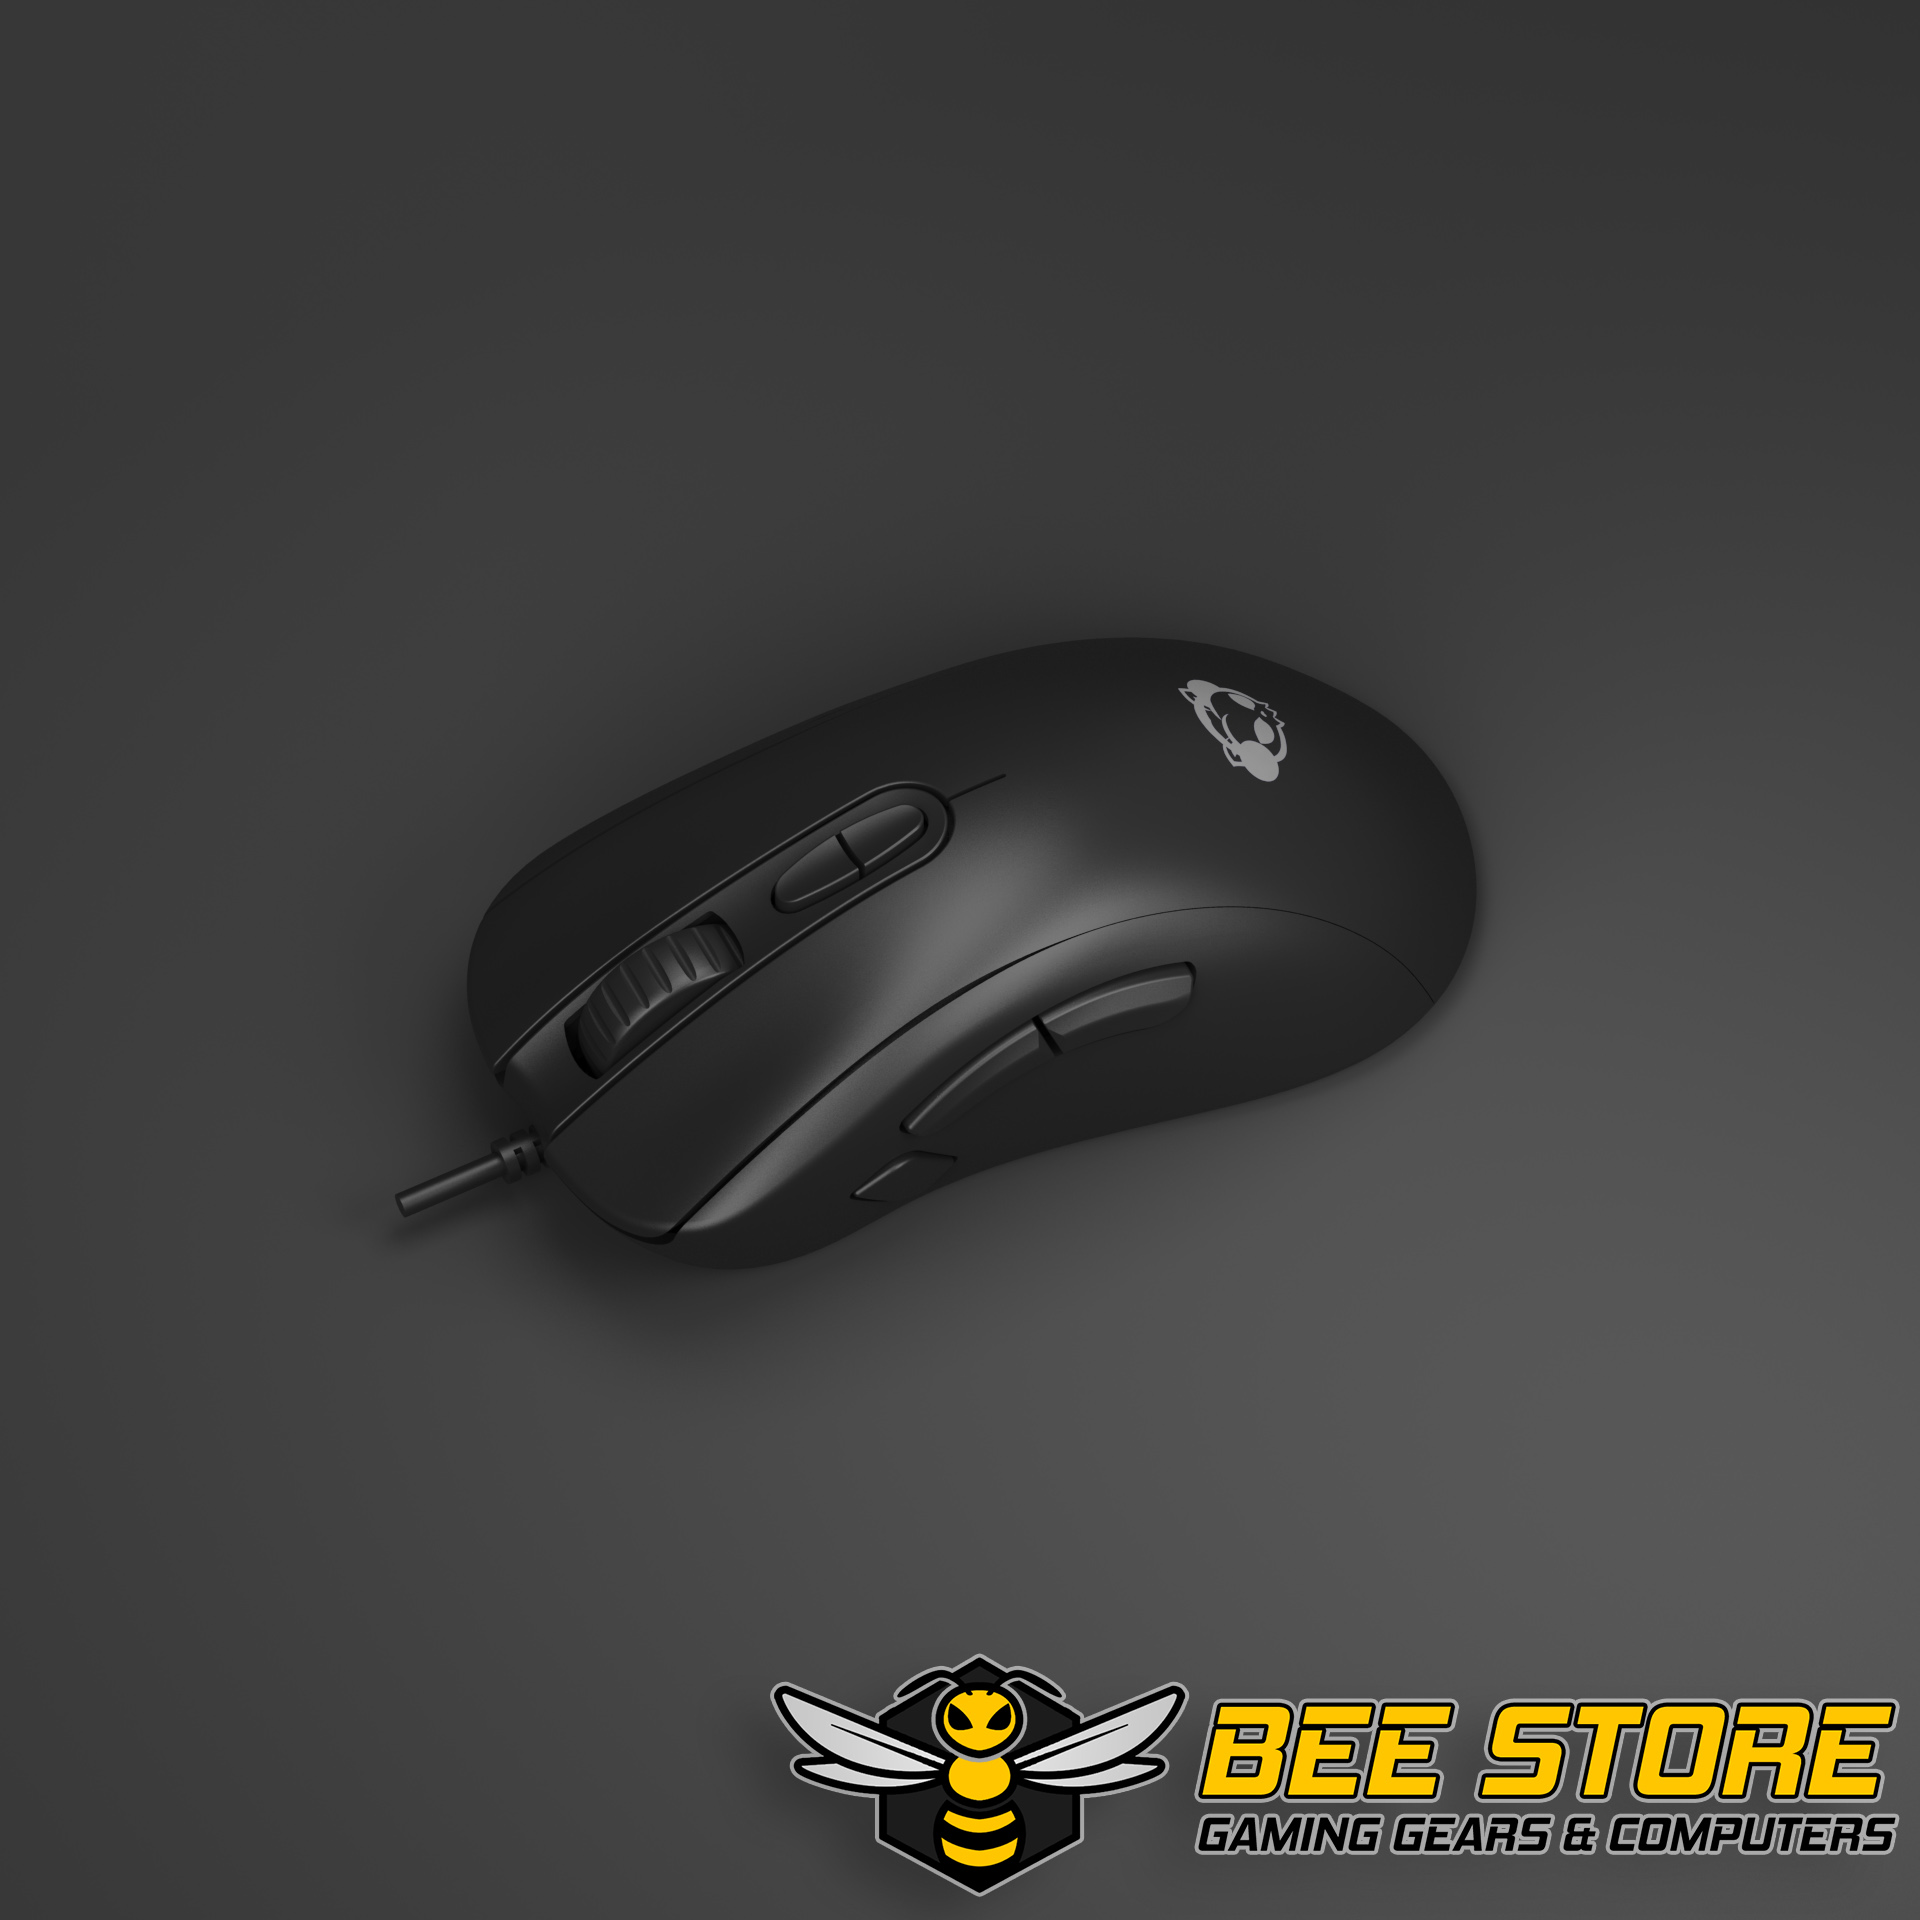 chuot-gaming-akko-rg389-black-beegaming-16